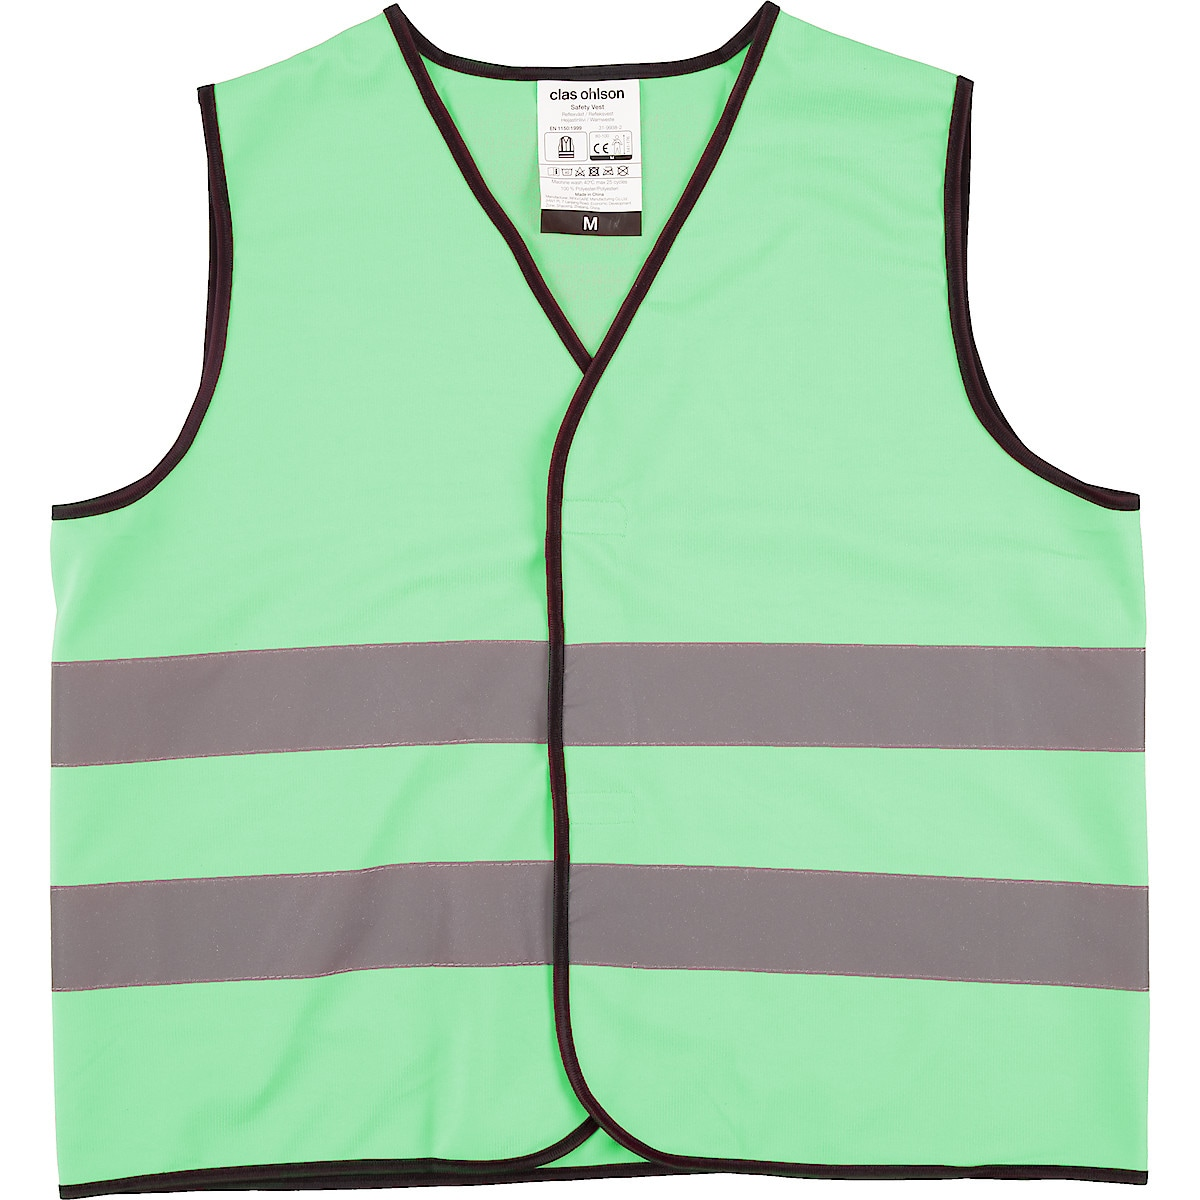 Reflexväst grön Clas Ohlson